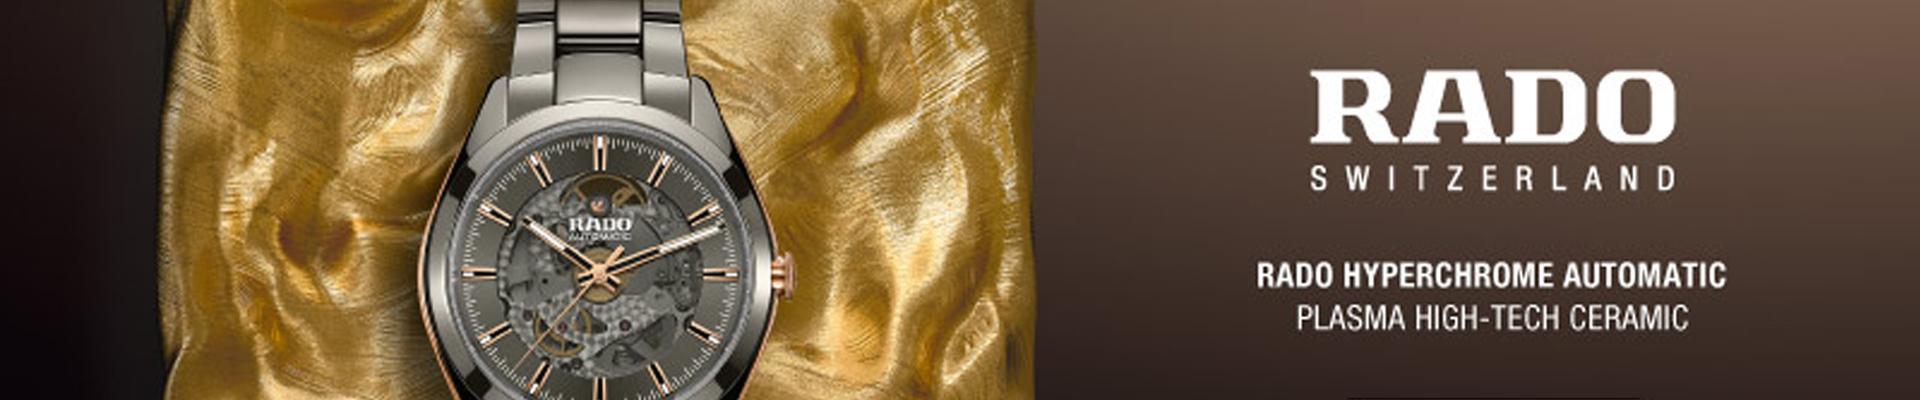 Rado horloges - Slider